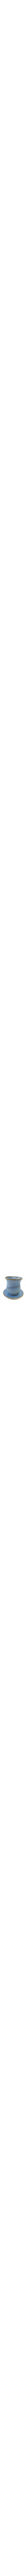 Shabbat Kiddush cup